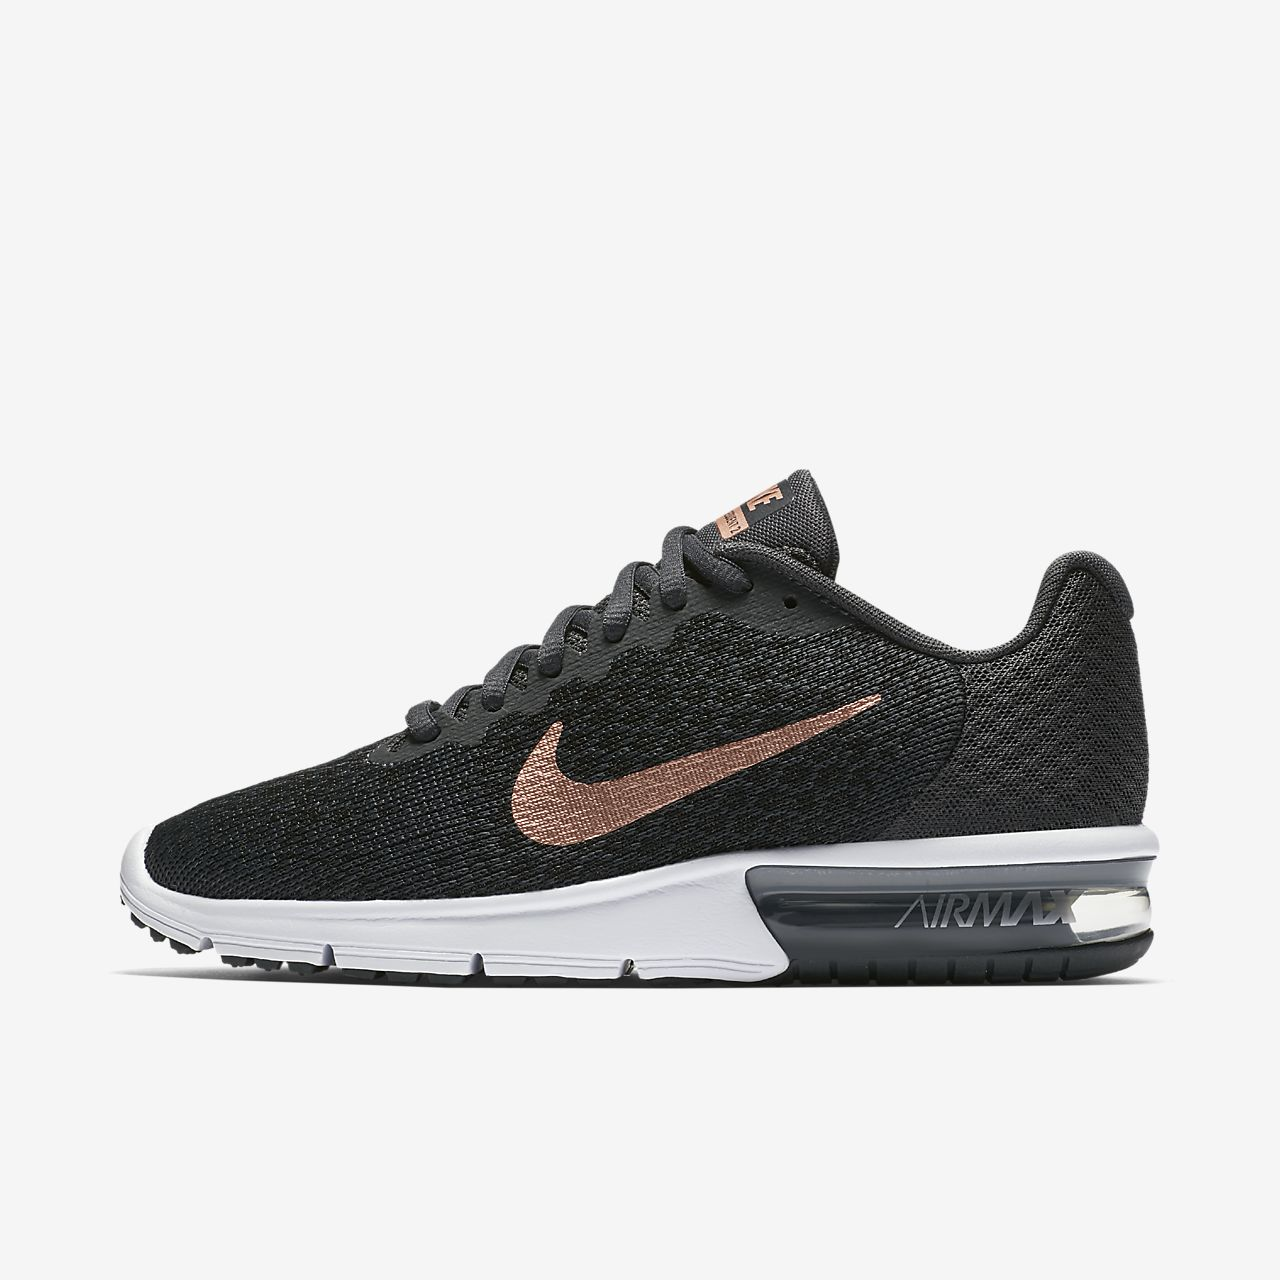 37210634e4 Nike Air Max Sequent 2 Women's Shoe. Nike.com GB